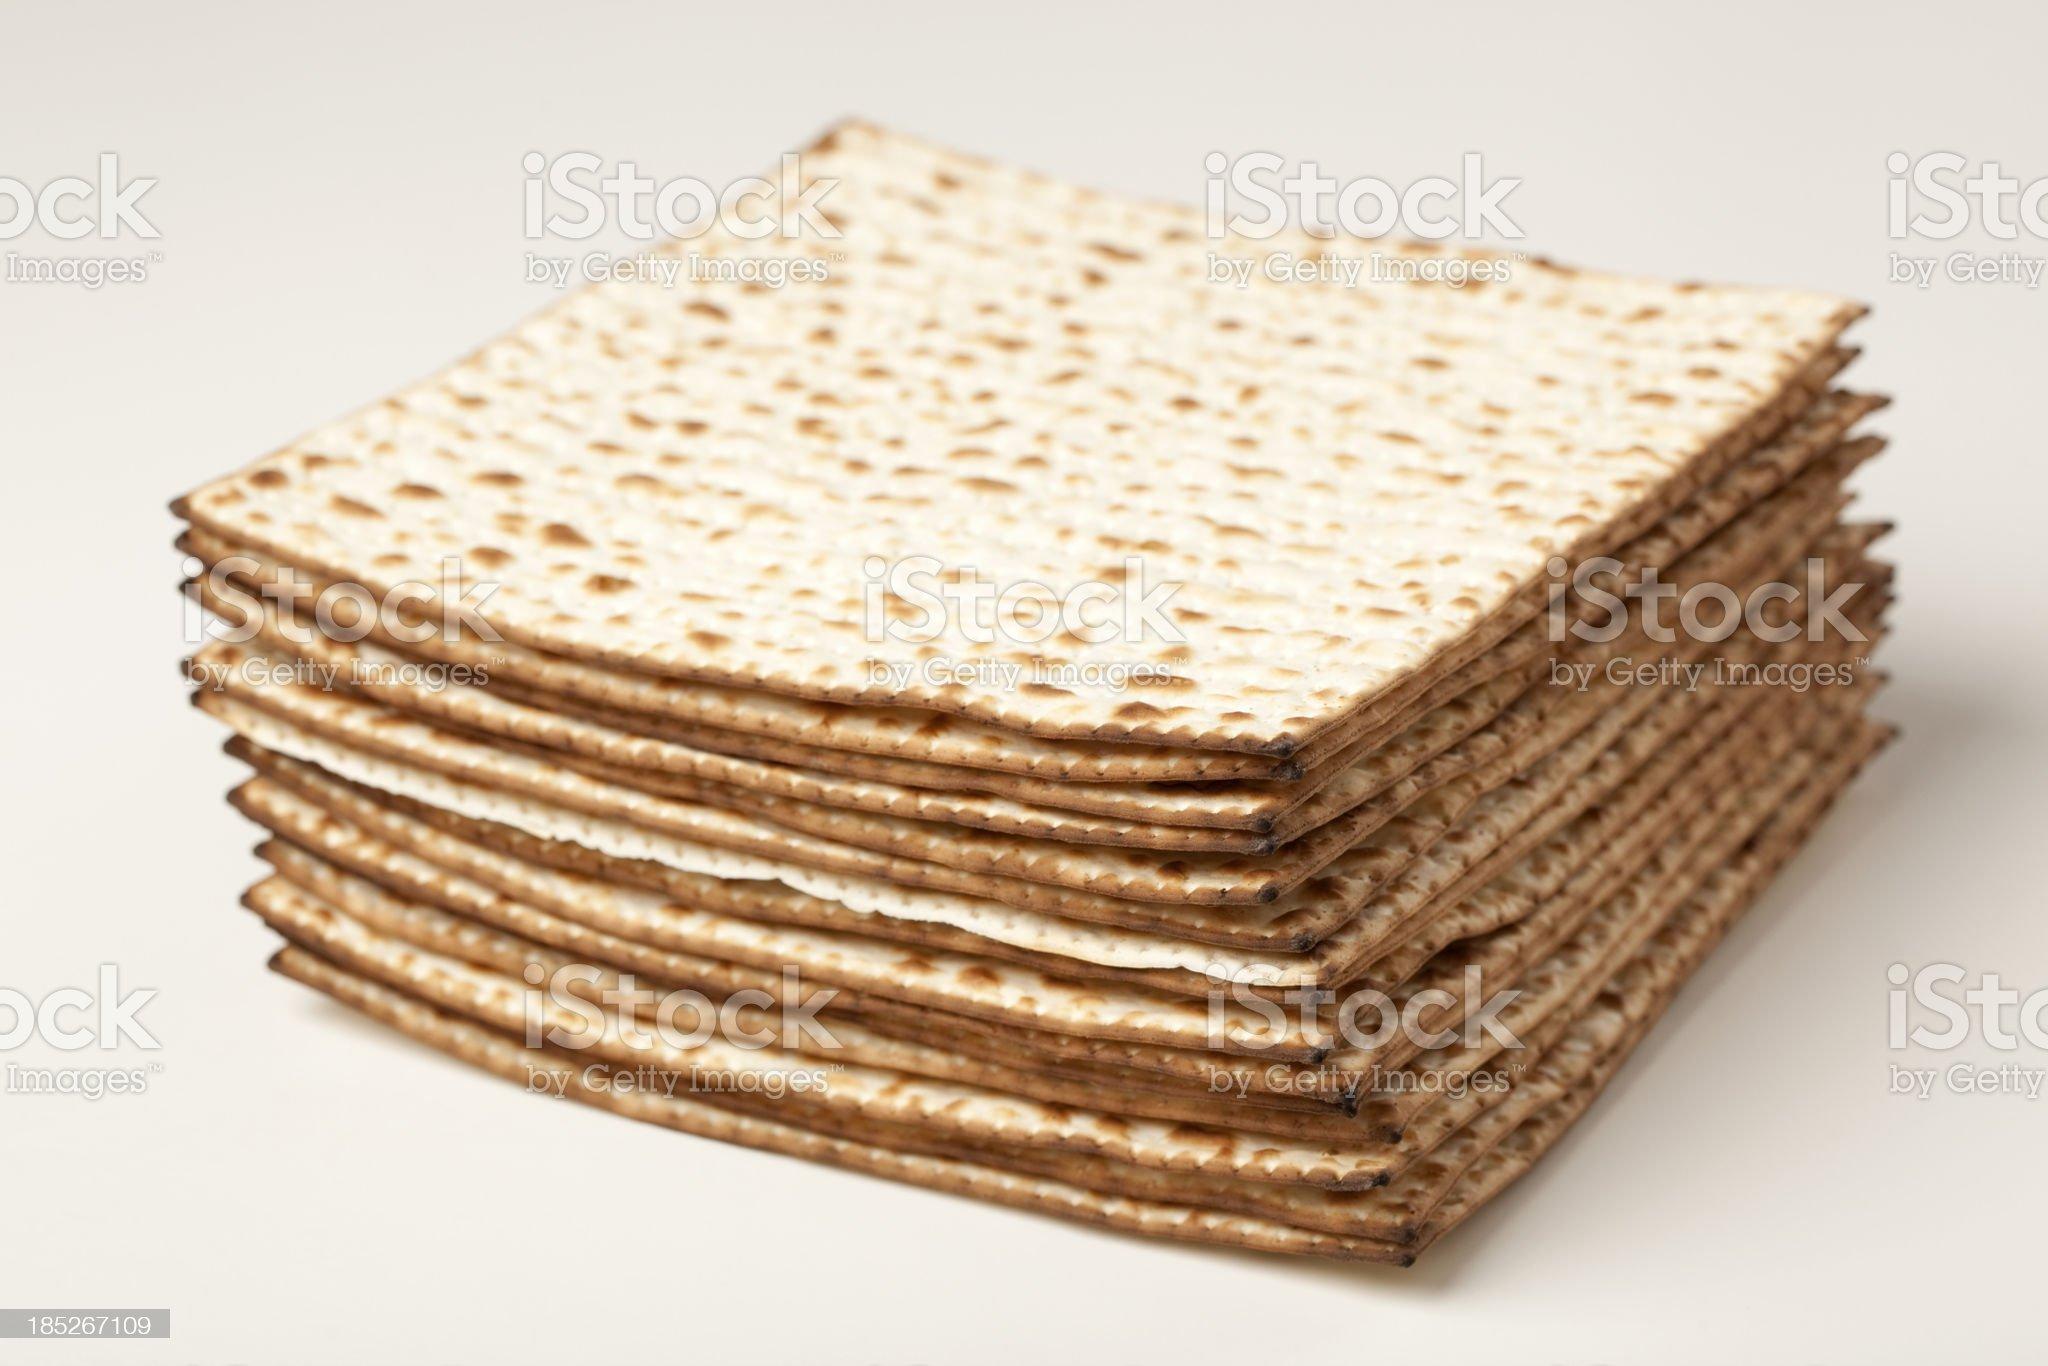 Passover matzos. royalty-free stock photo